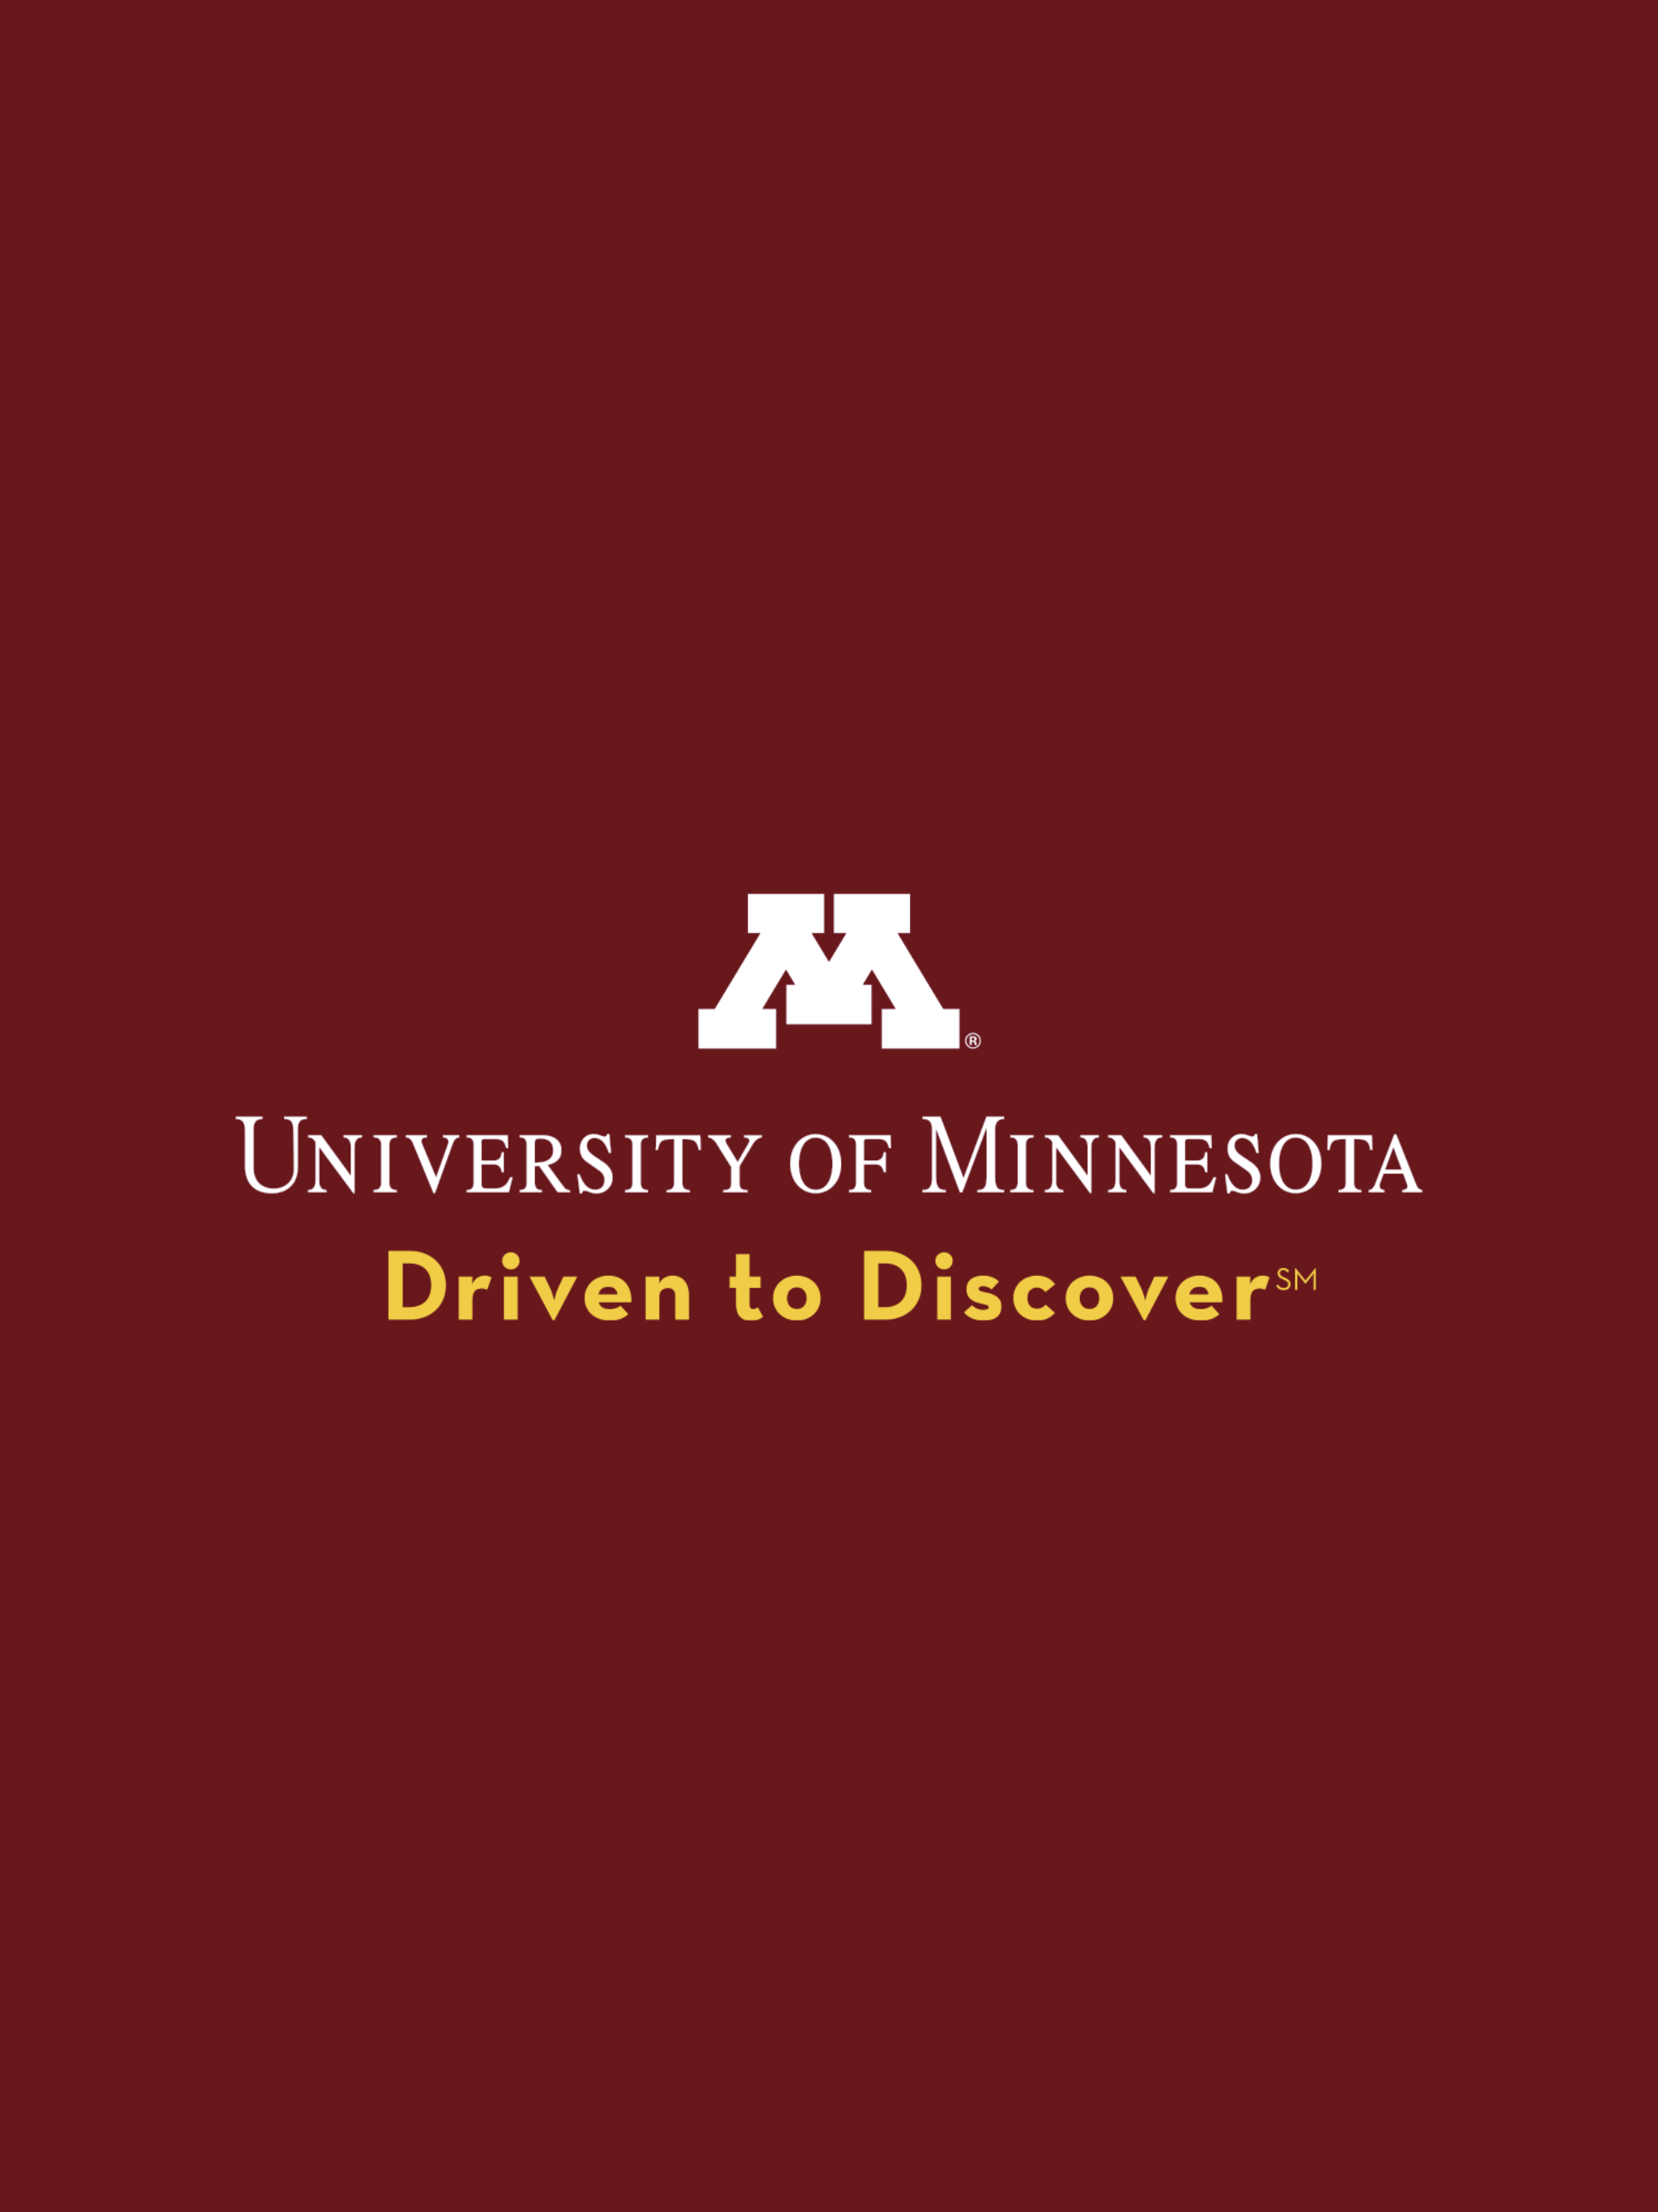 U Of Minnesota Map.Get The University Of Minnesota App Powered By Guidebook